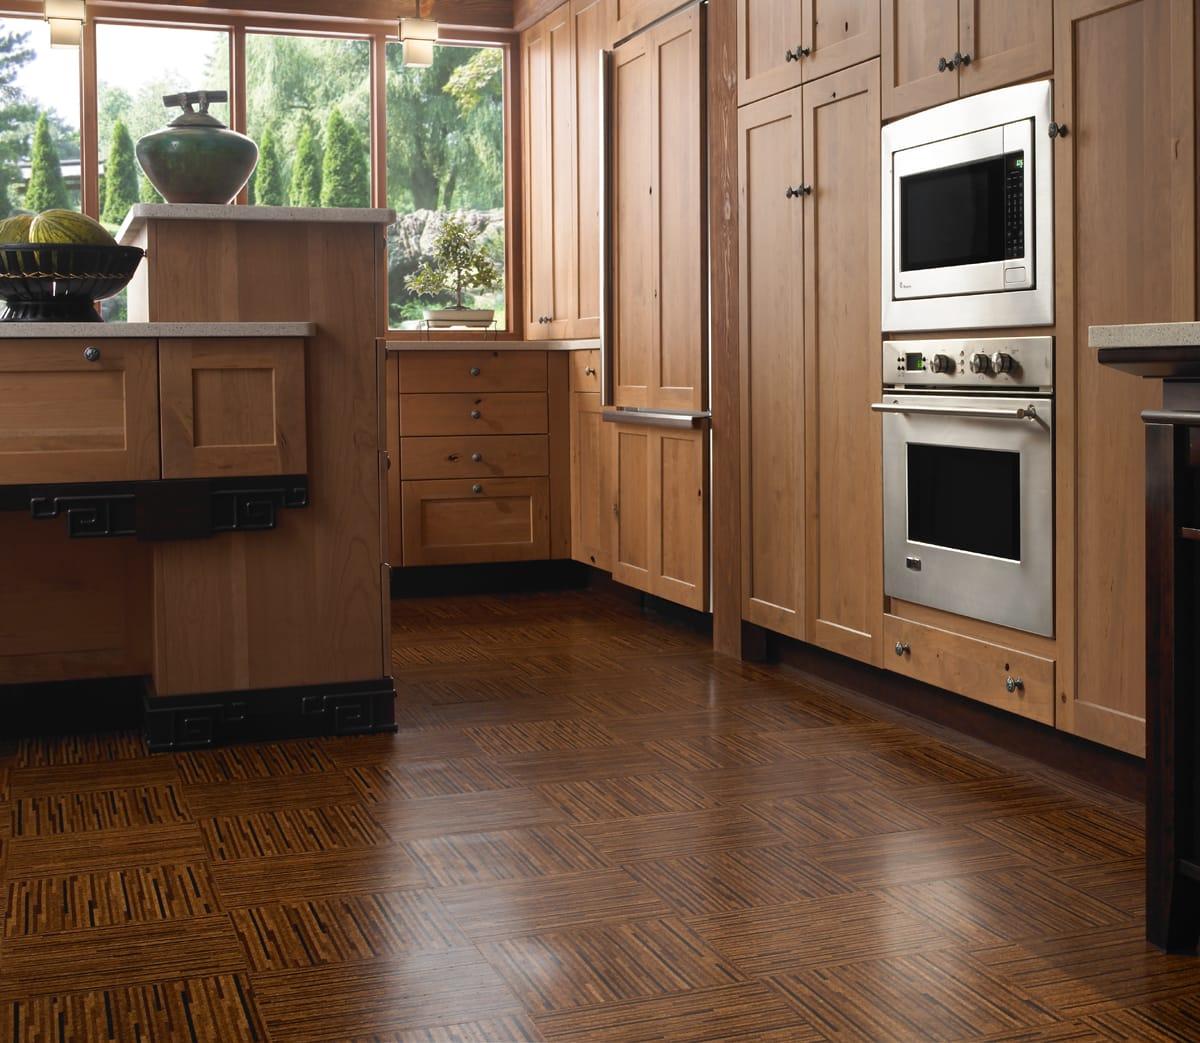 cork 2010 style natural interiors. Black Bedroom Furniture Sets. Home Design Ideas